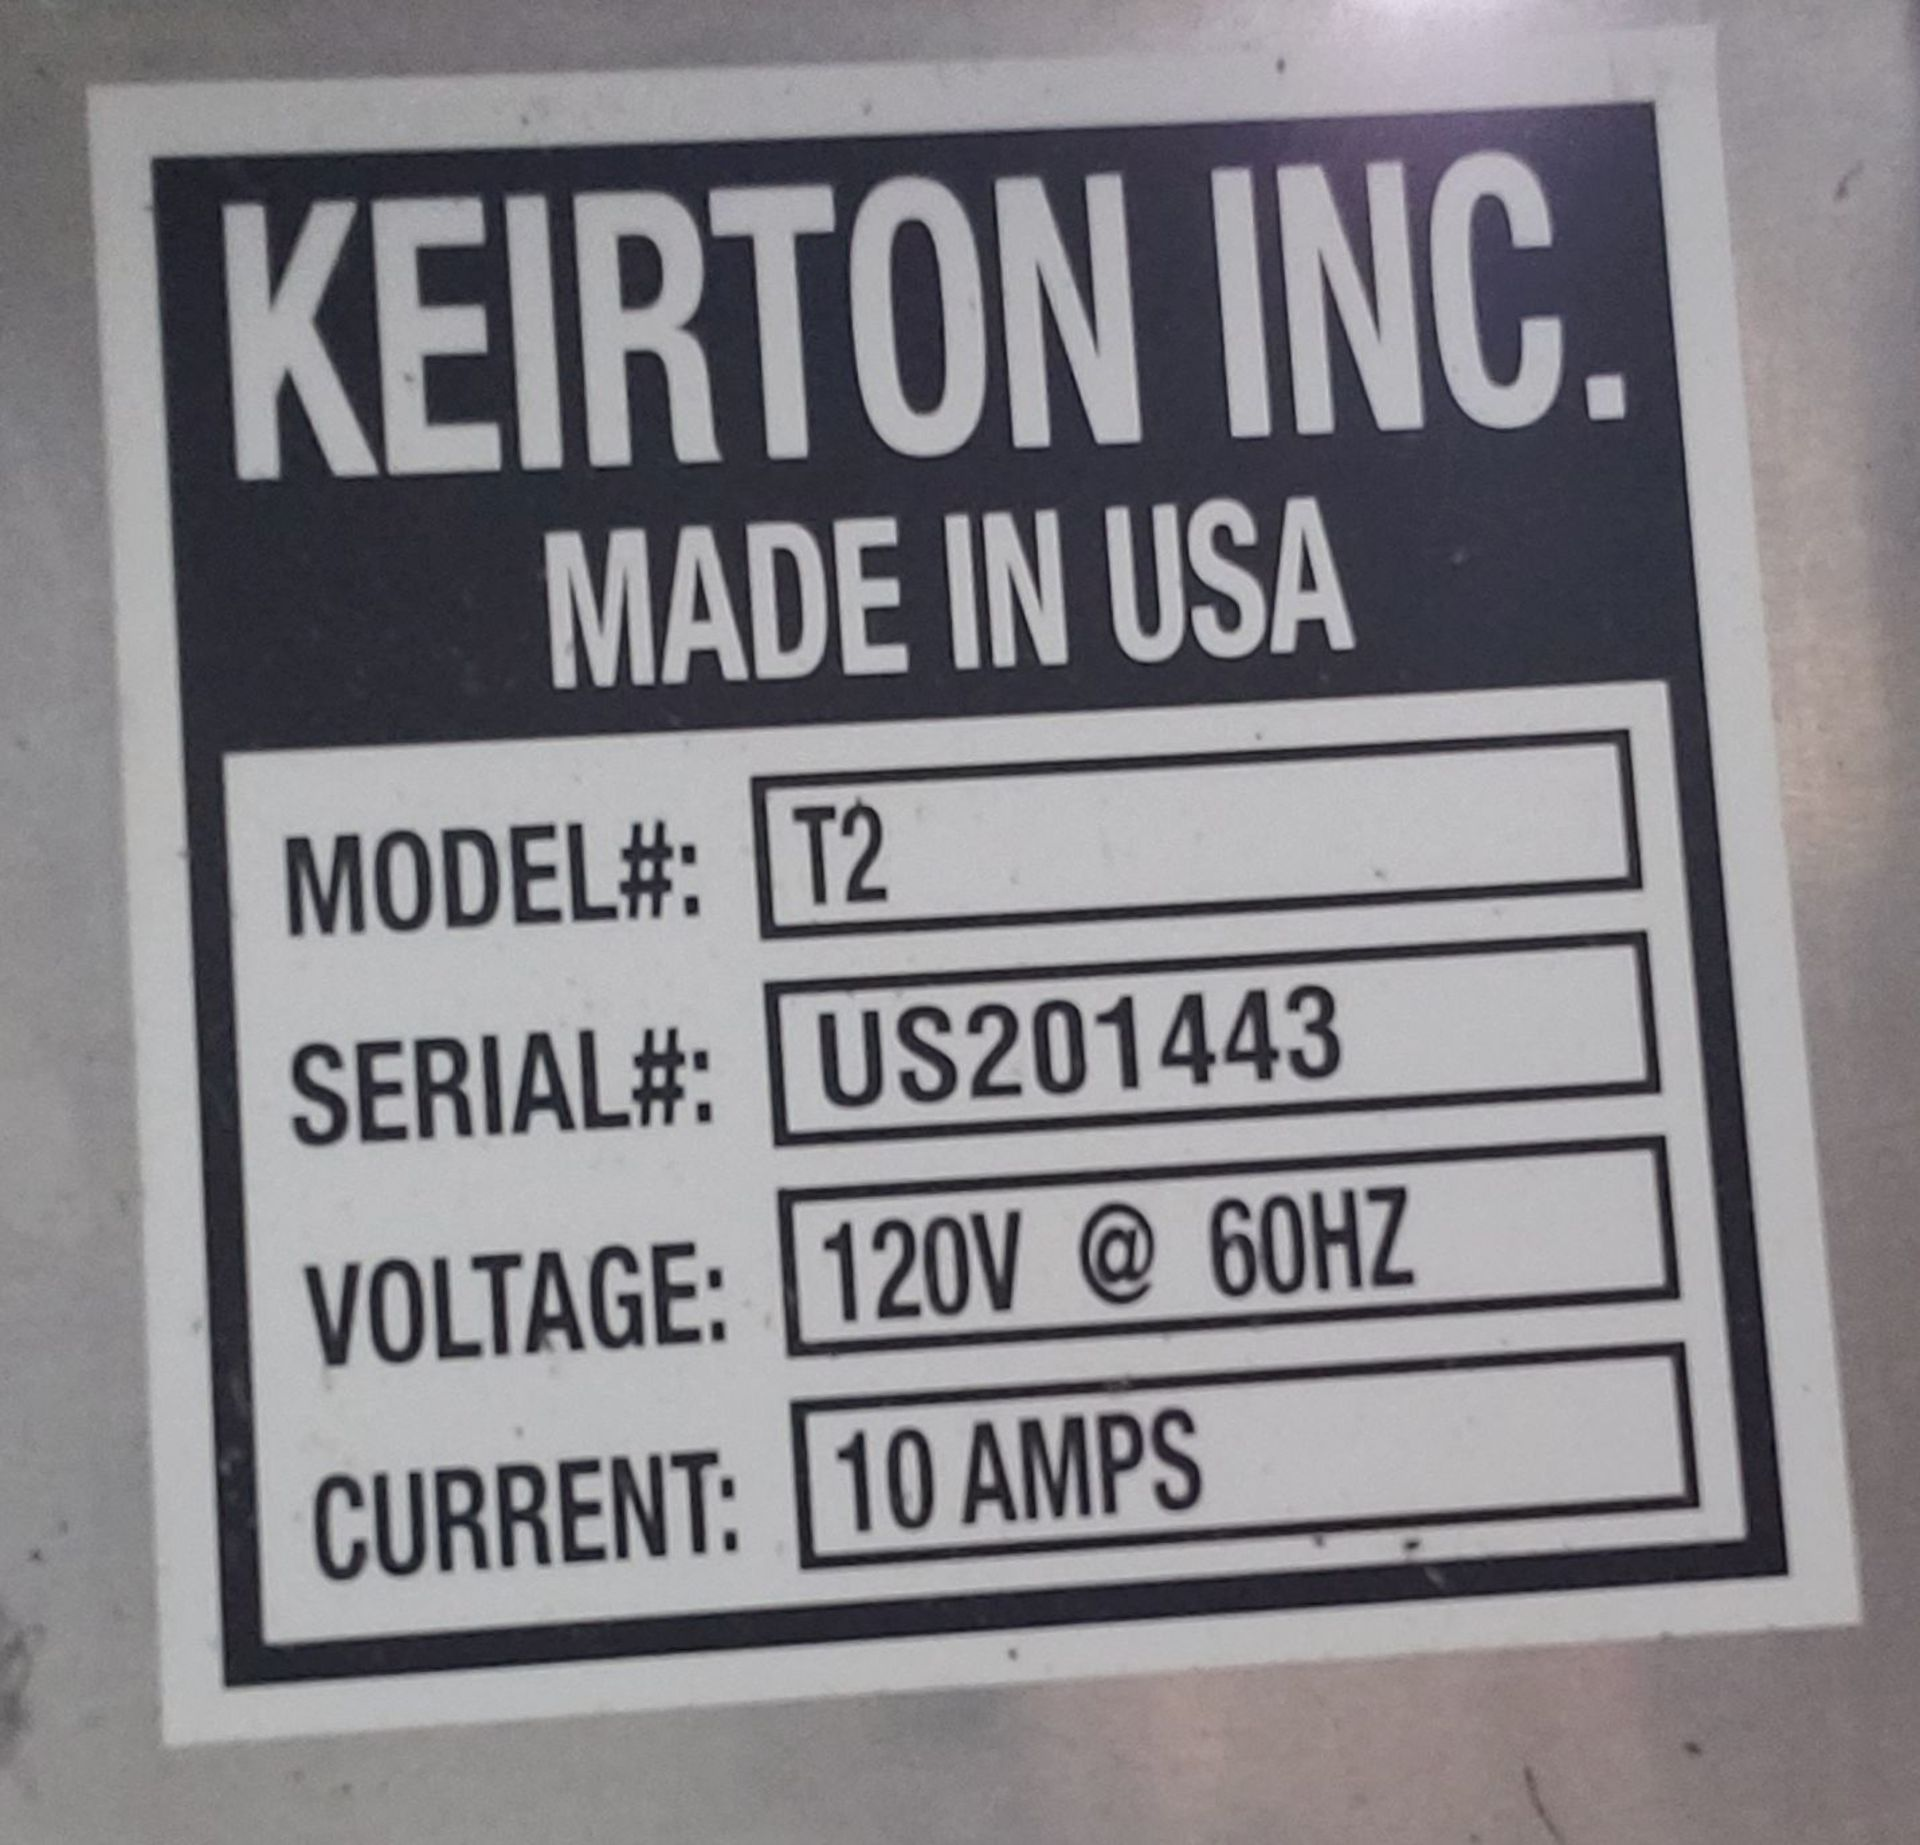 Kierton Inc Twister T2 - Bud Trimmer - Image 11 of 13